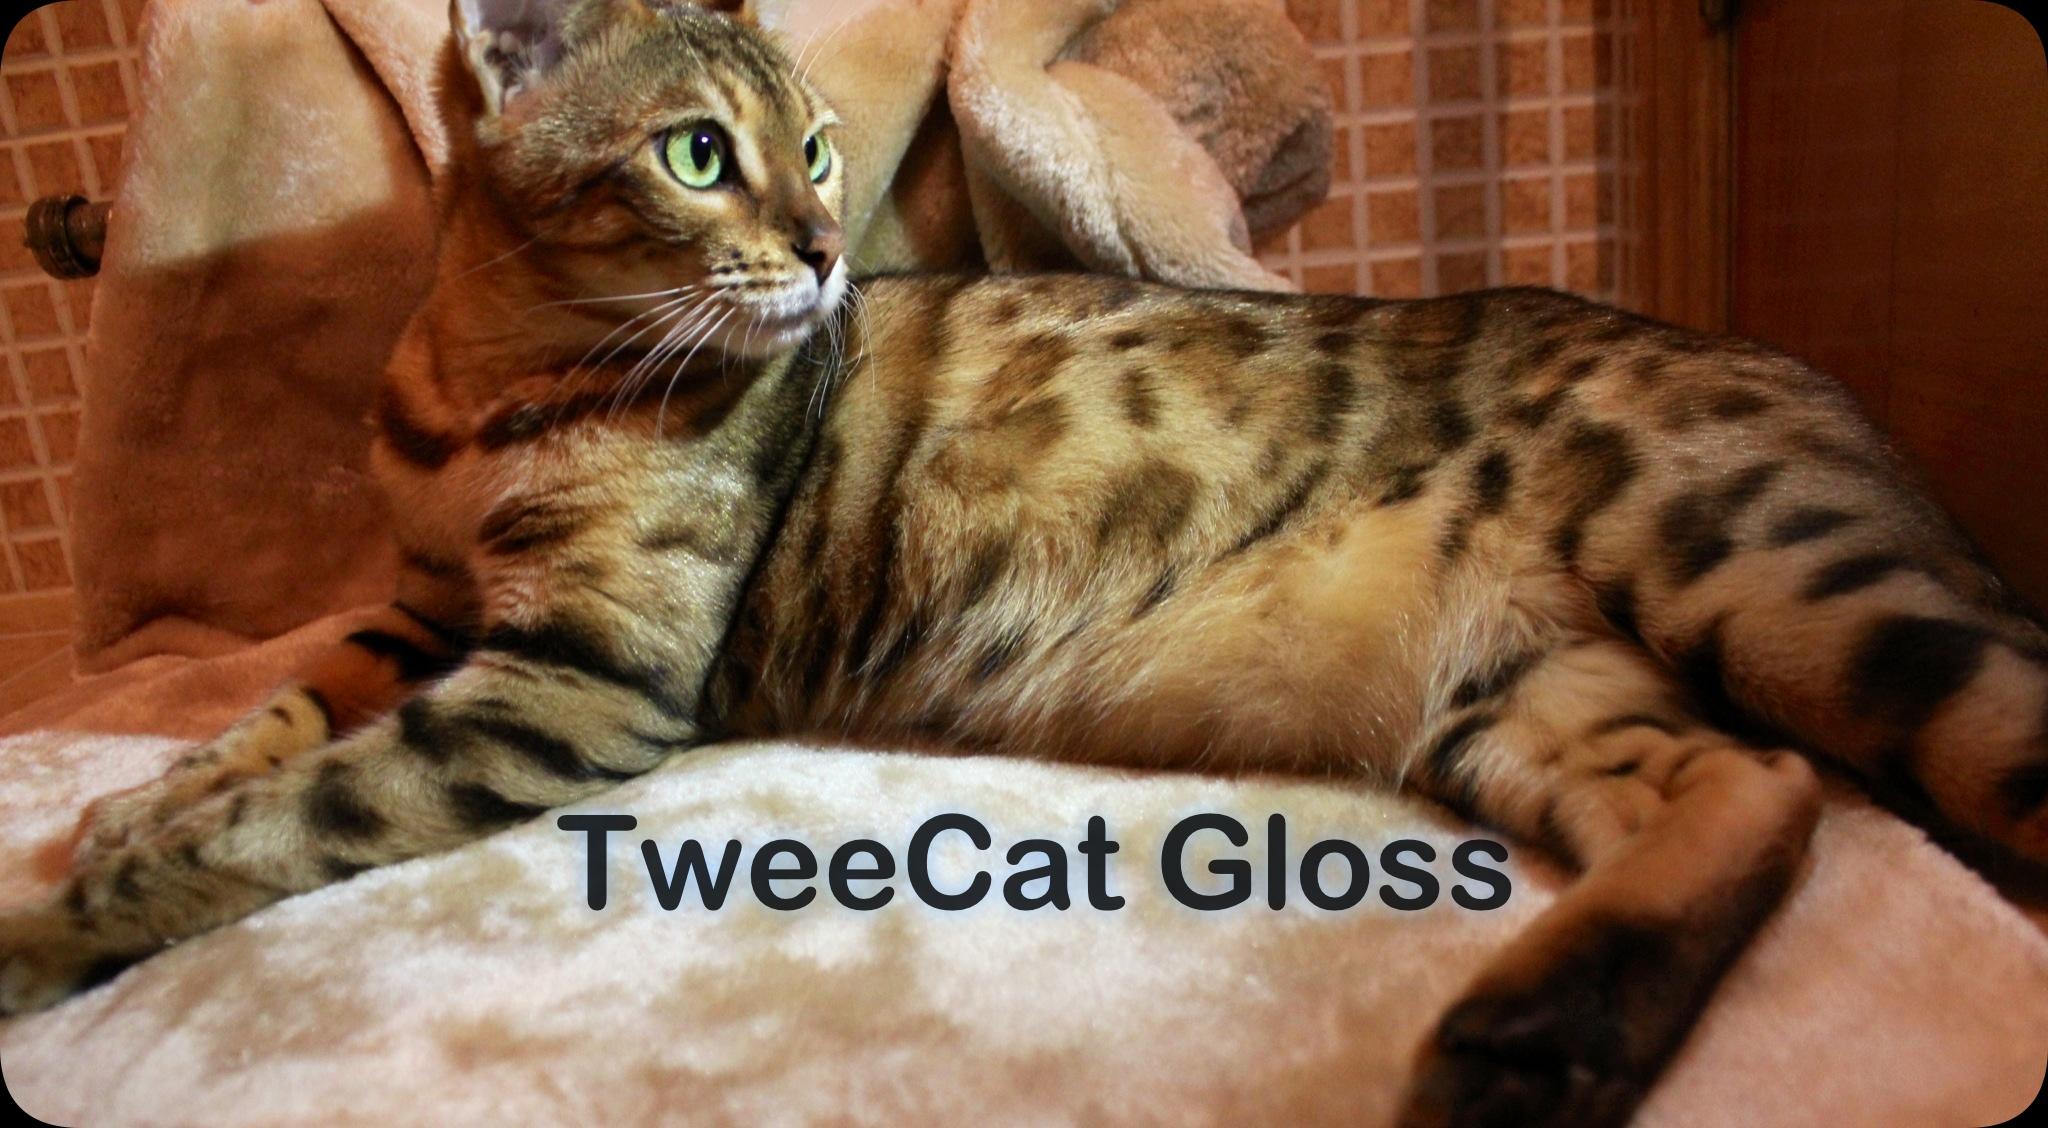 TweeCat Gloss